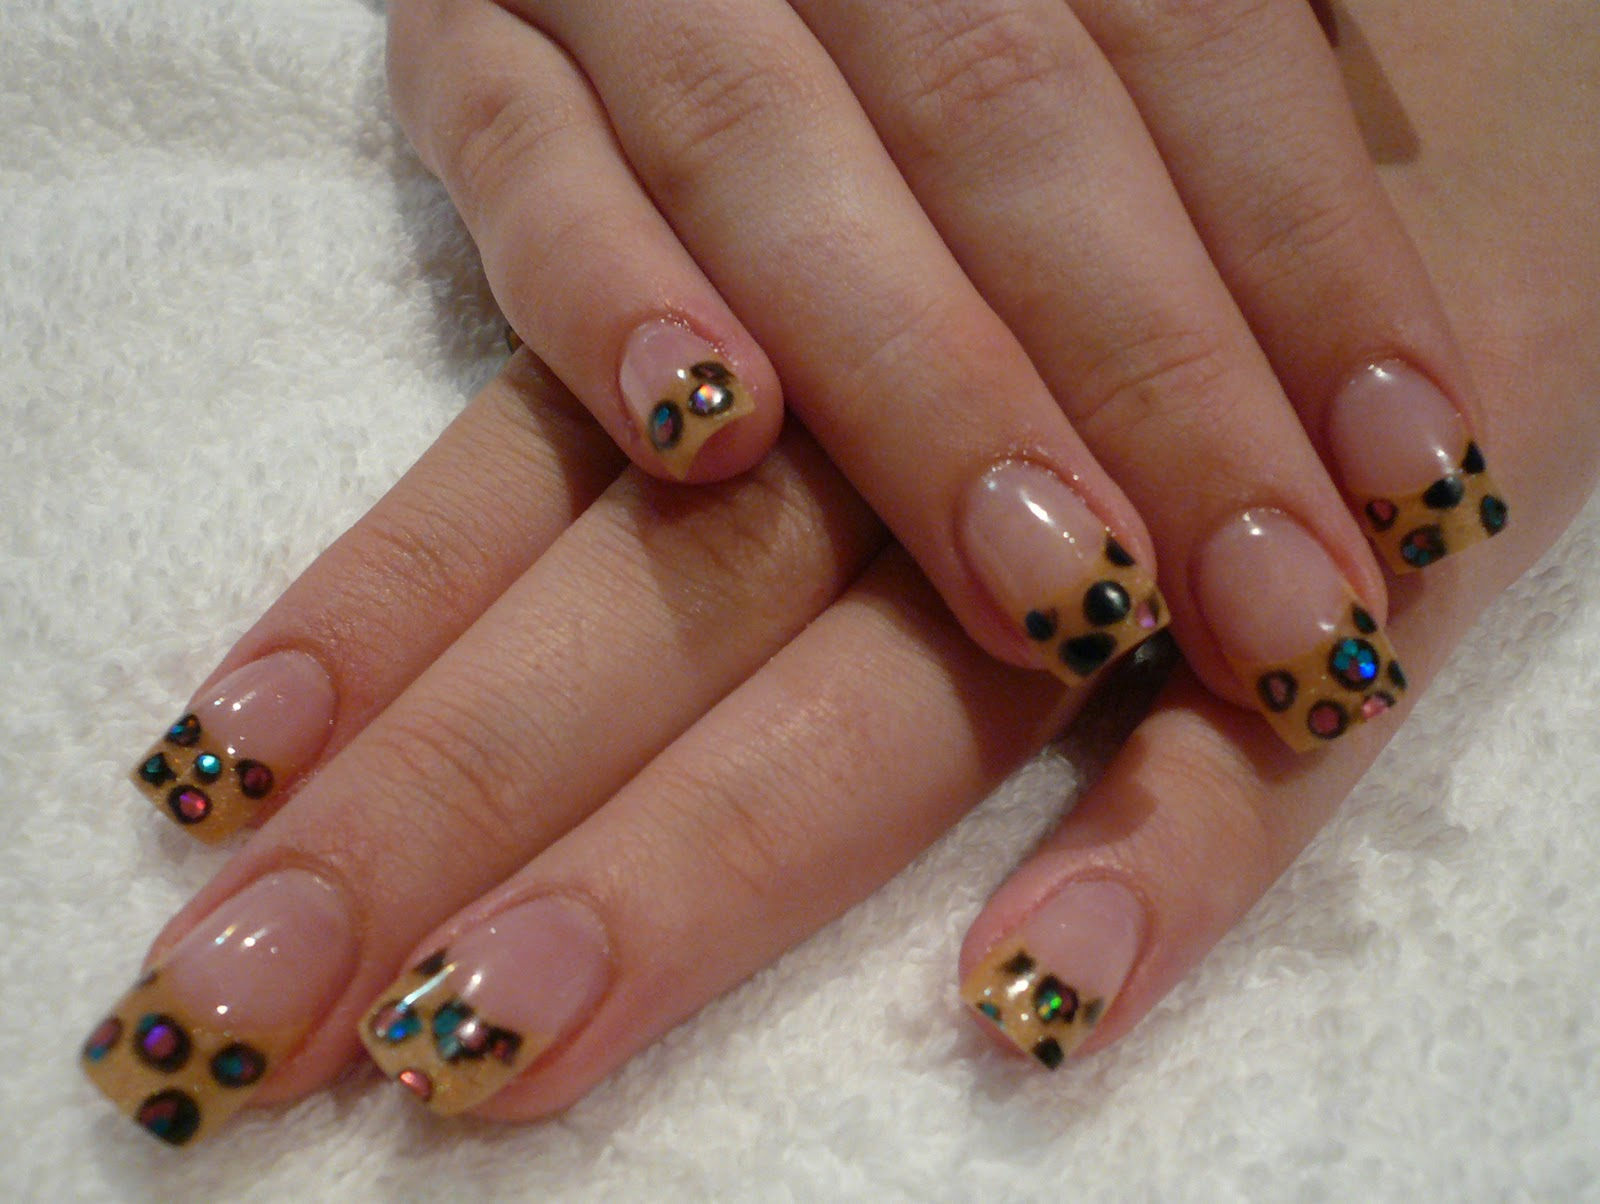 Panache Nail Studio: Leopard Acrylics